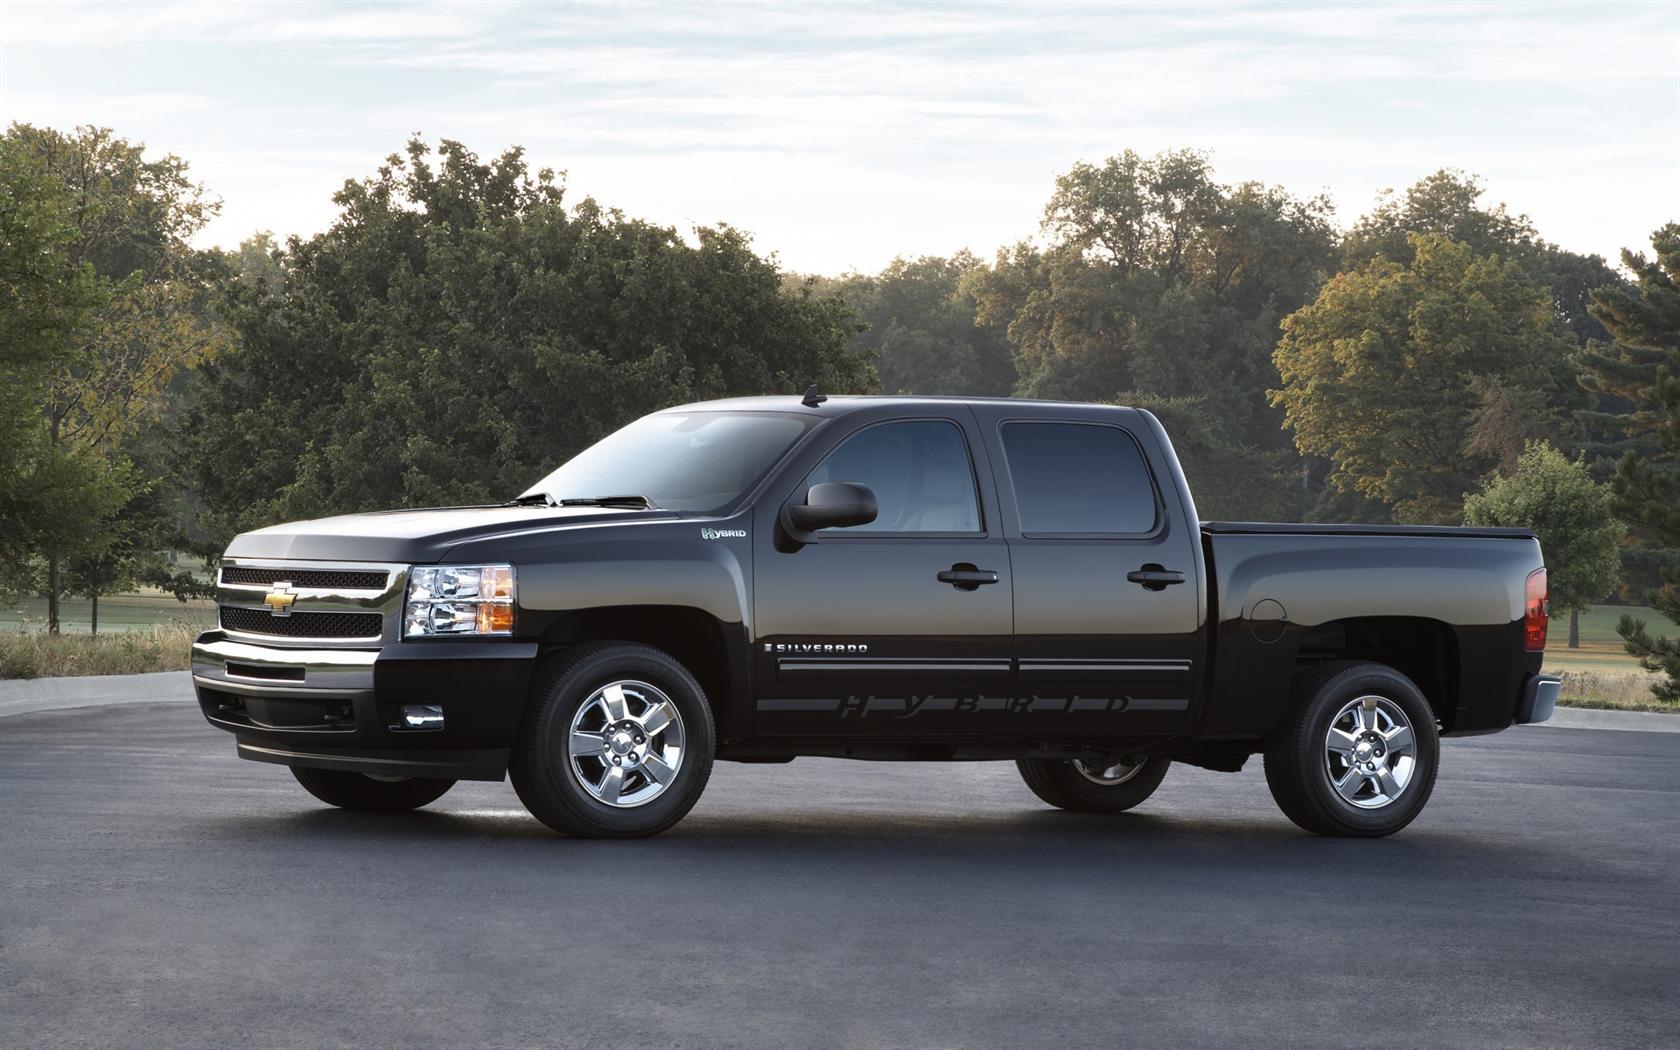 Silverado chevy 2010 silverado : 2010 Chevrolet Silverado Hybrid Image. https://www.conceptcarz.com ...